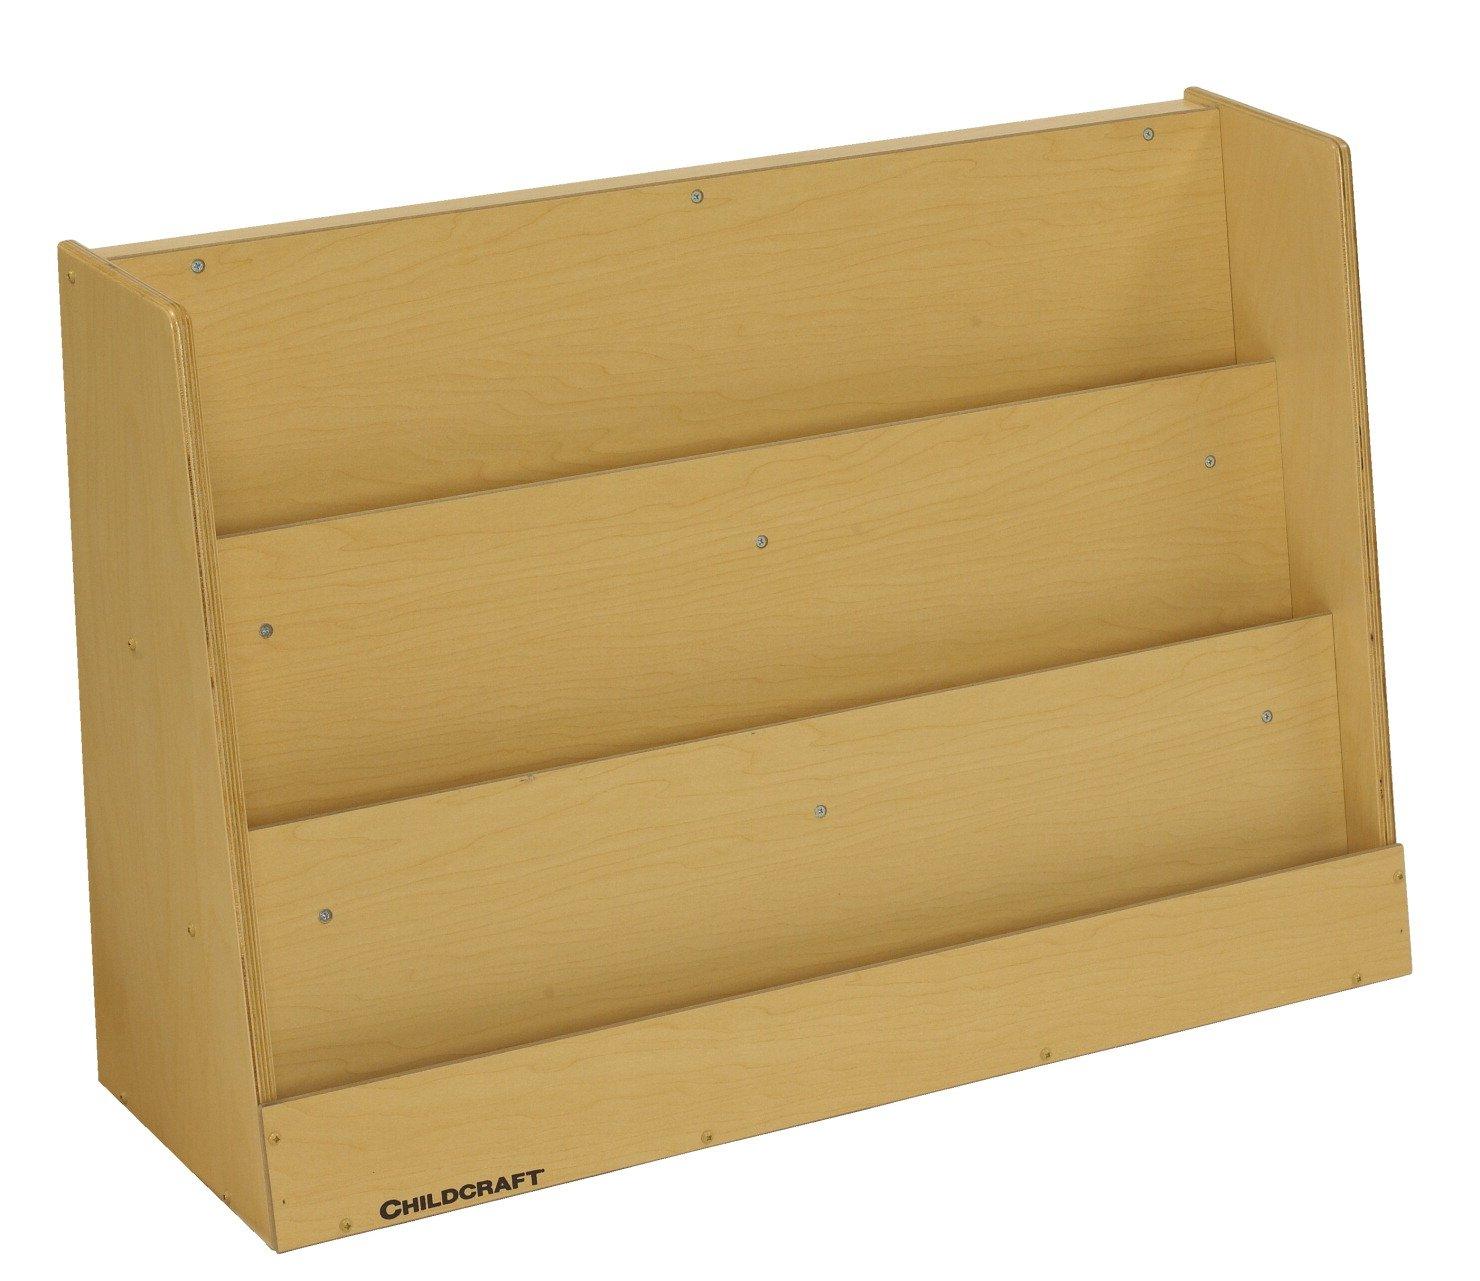 Childcraft Toddler 3-Shelf Book Display, 36 W x 12 D x 24 H in